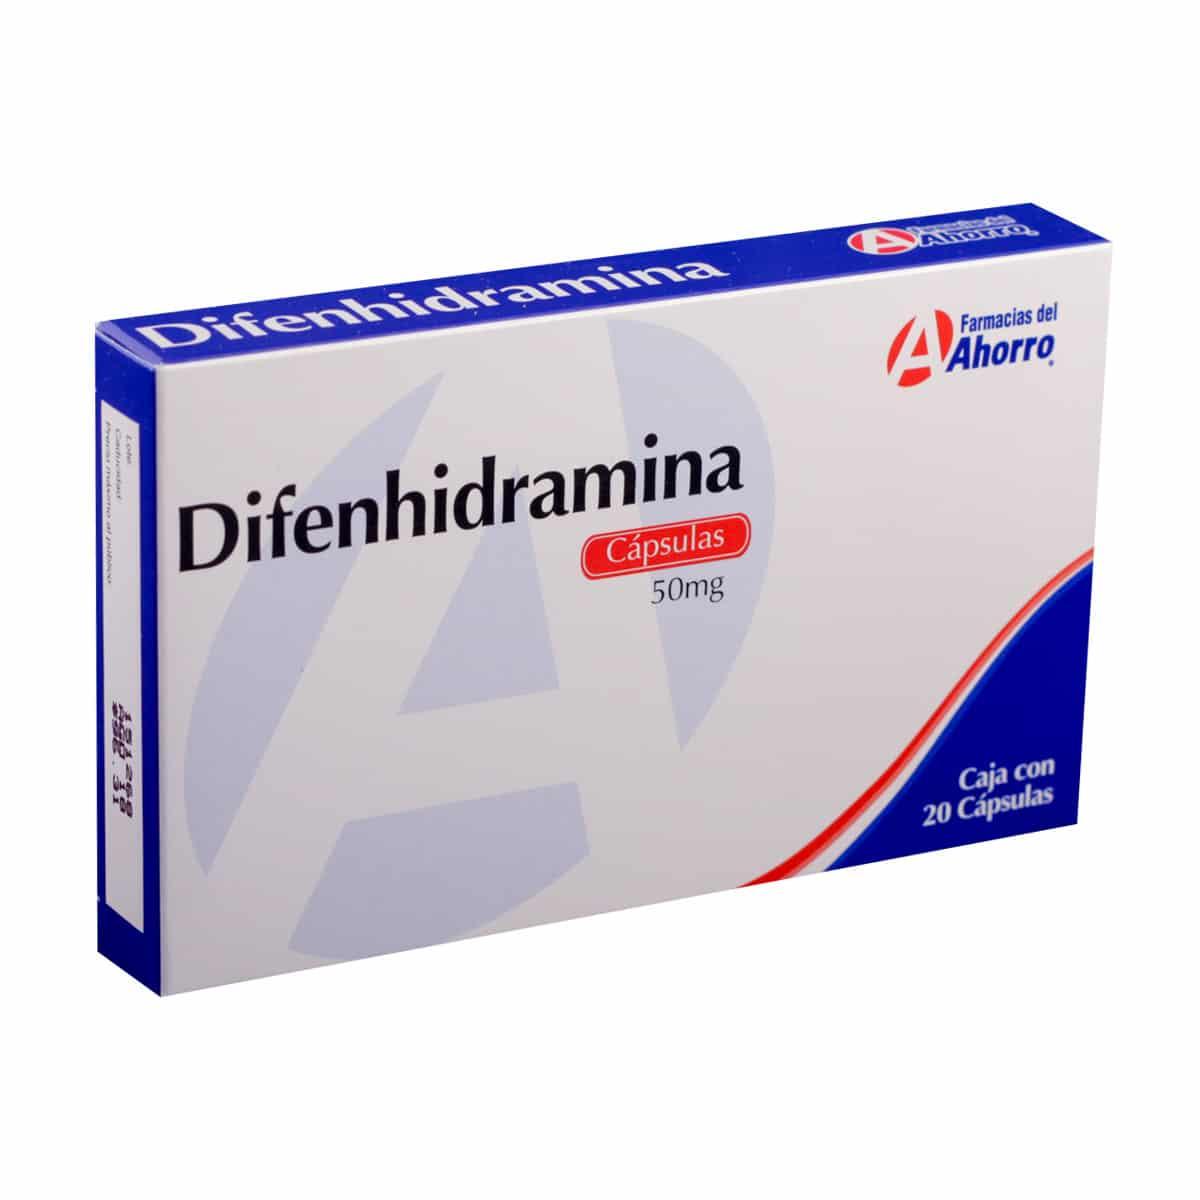 difenhidramina